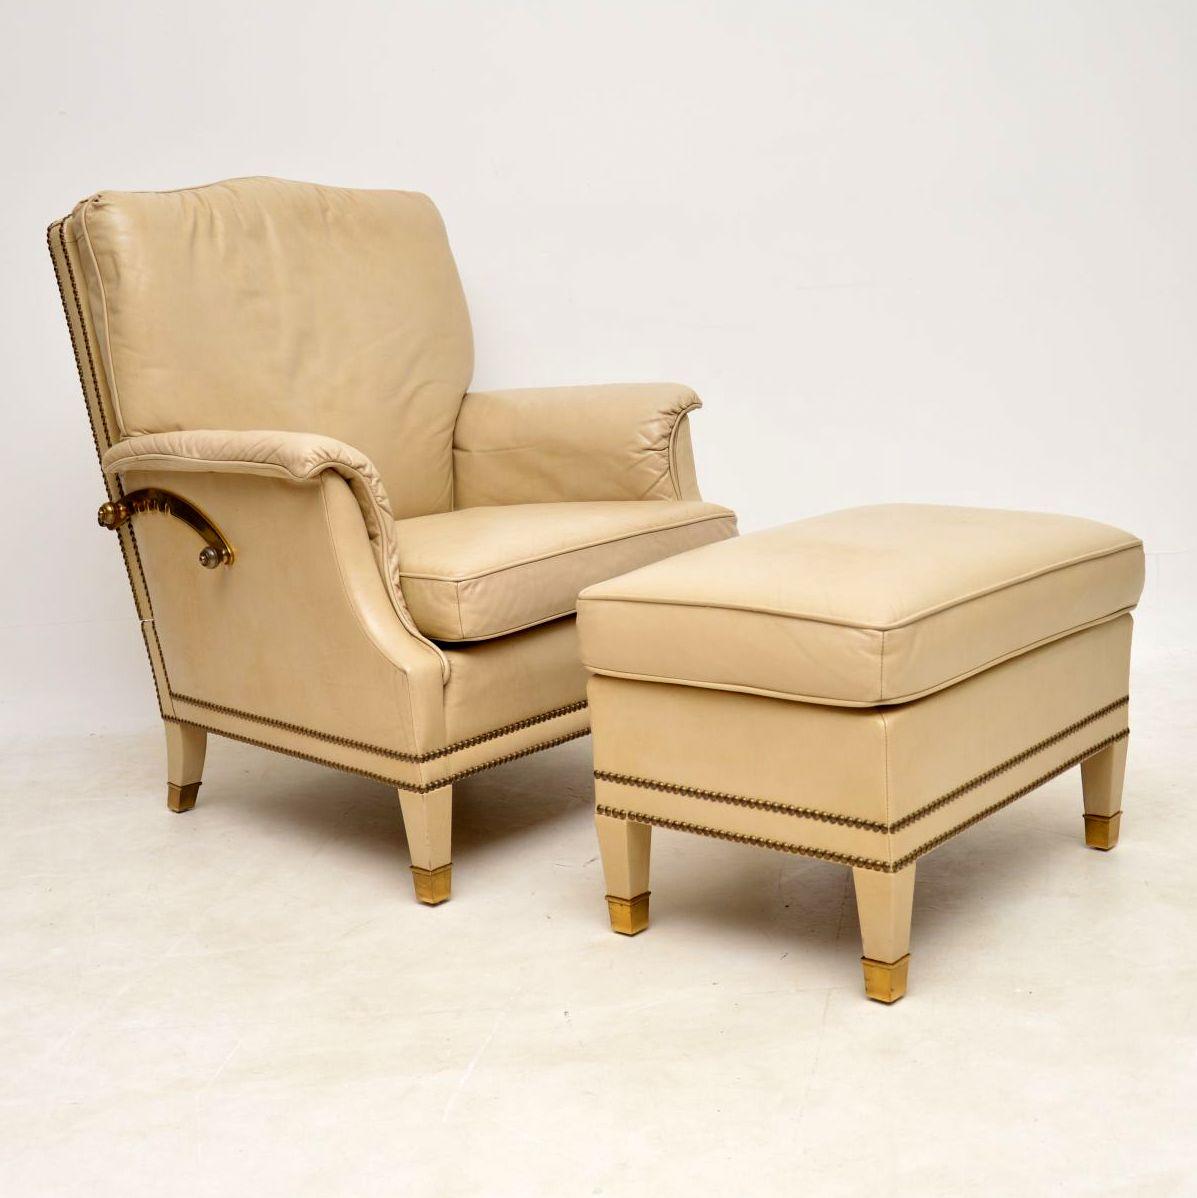 Antique Swedish Leather & Brass Reclining Armchair & Stool